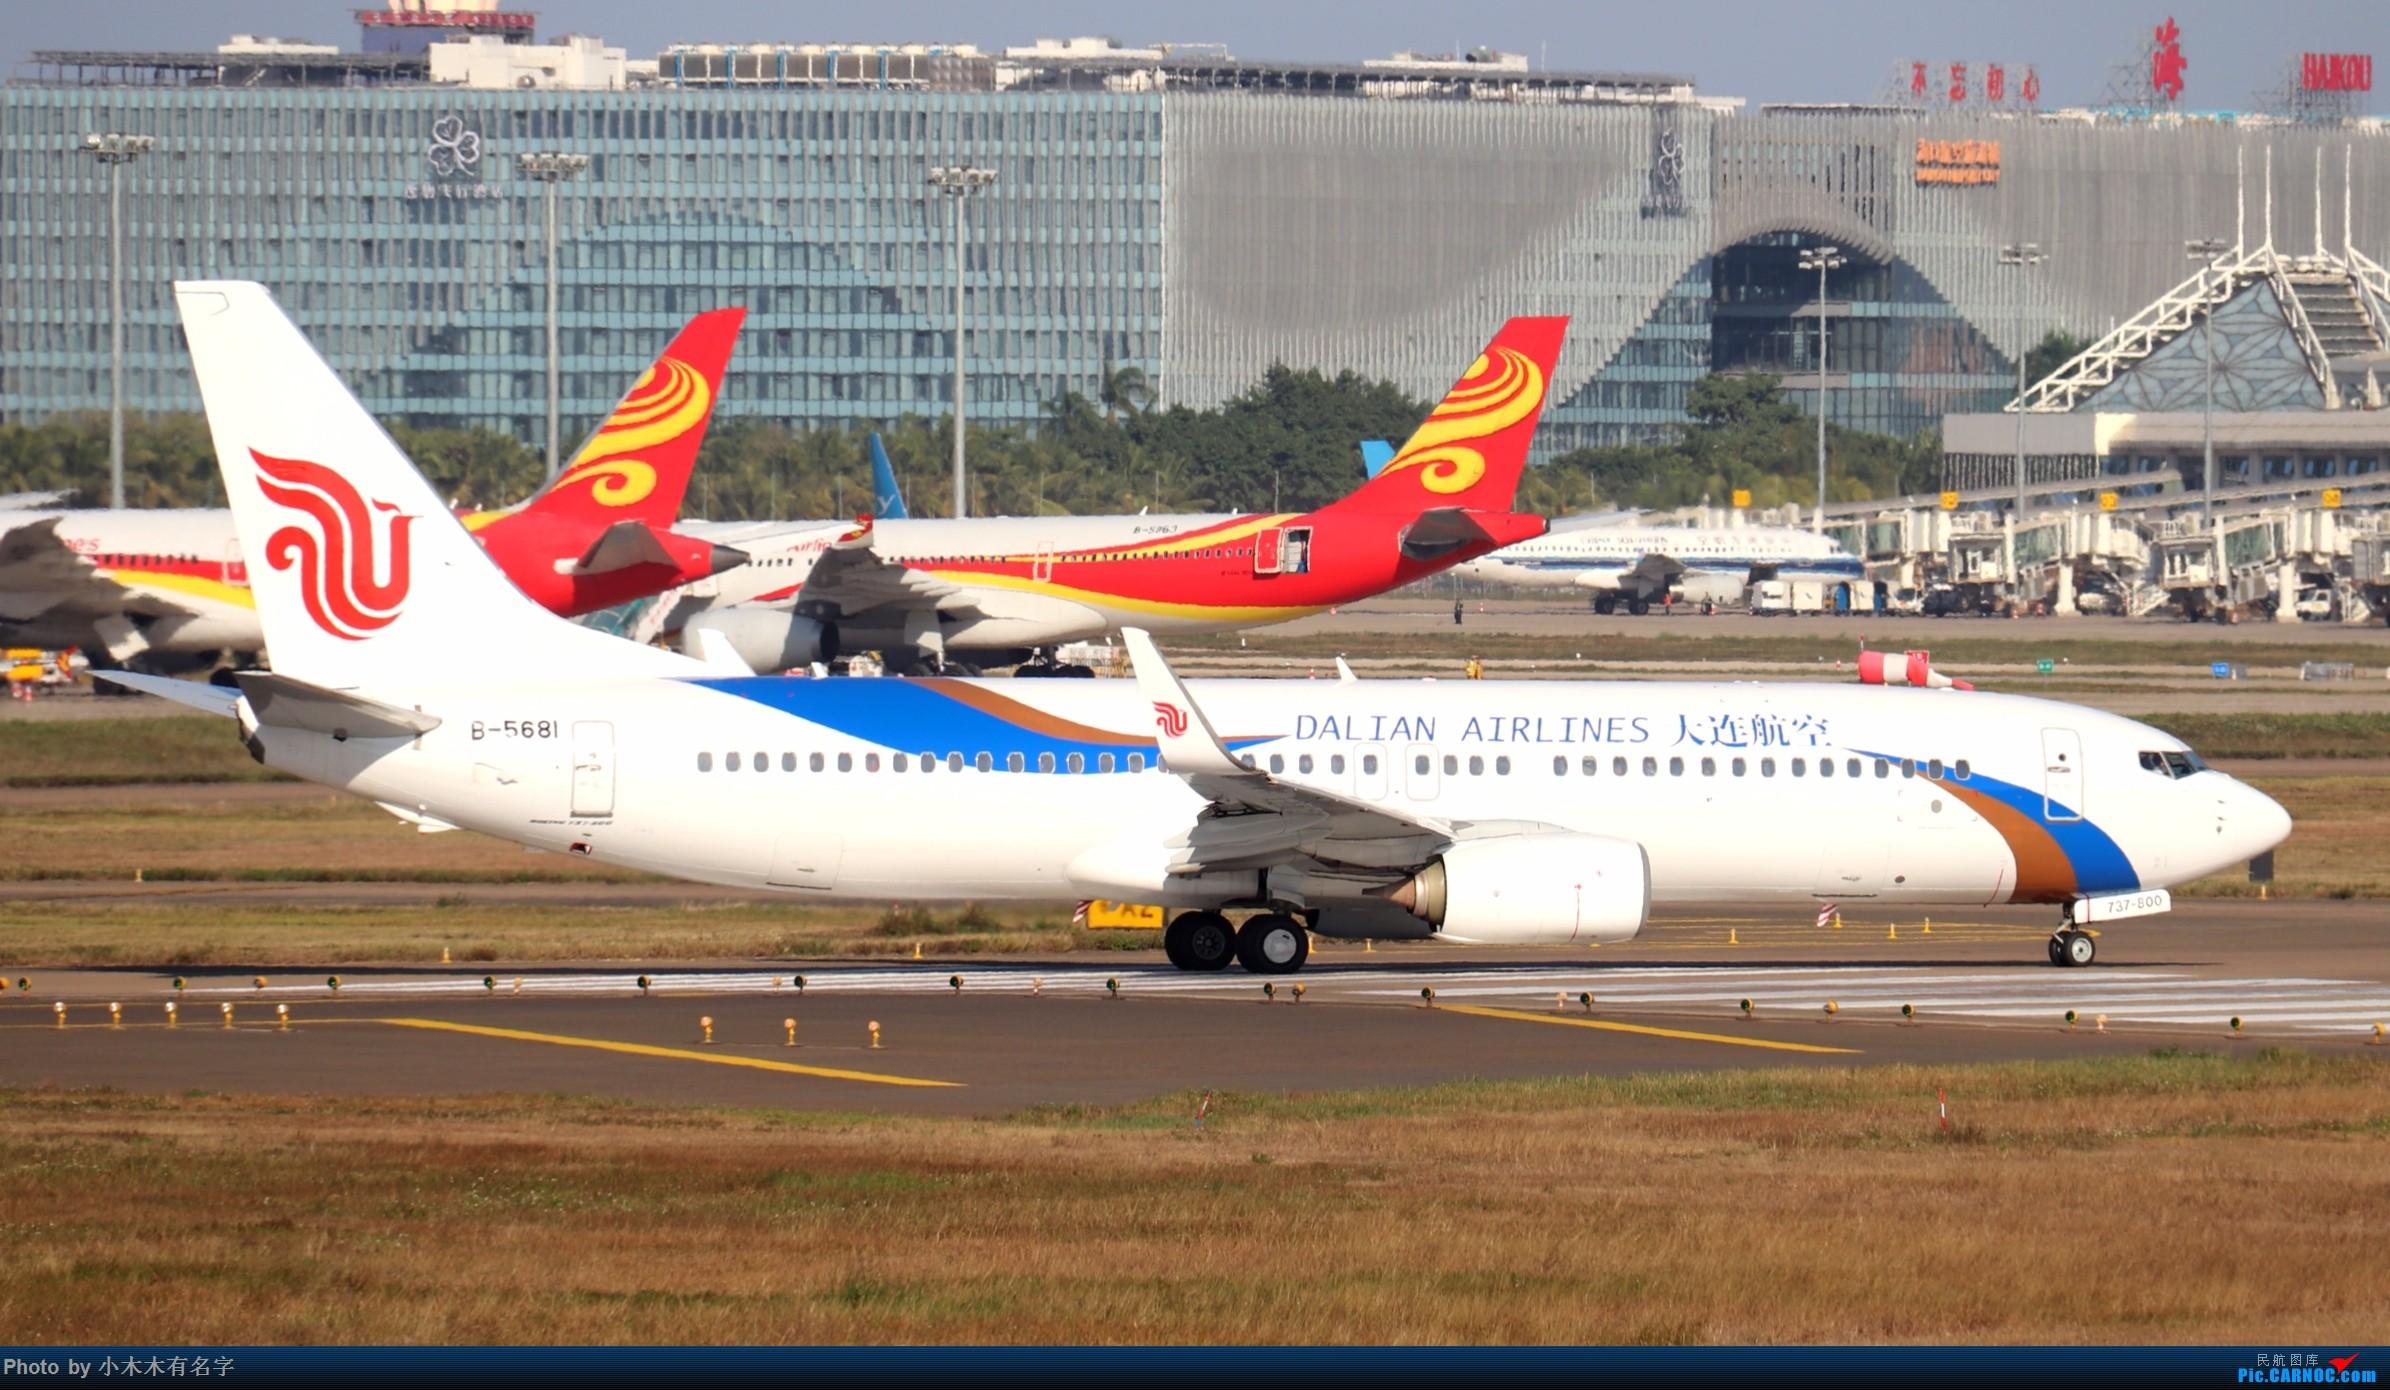 Re:[原创]2019冬天的海口美兰 BOEING 737-800 B-5681 中国海口美兰国际机场